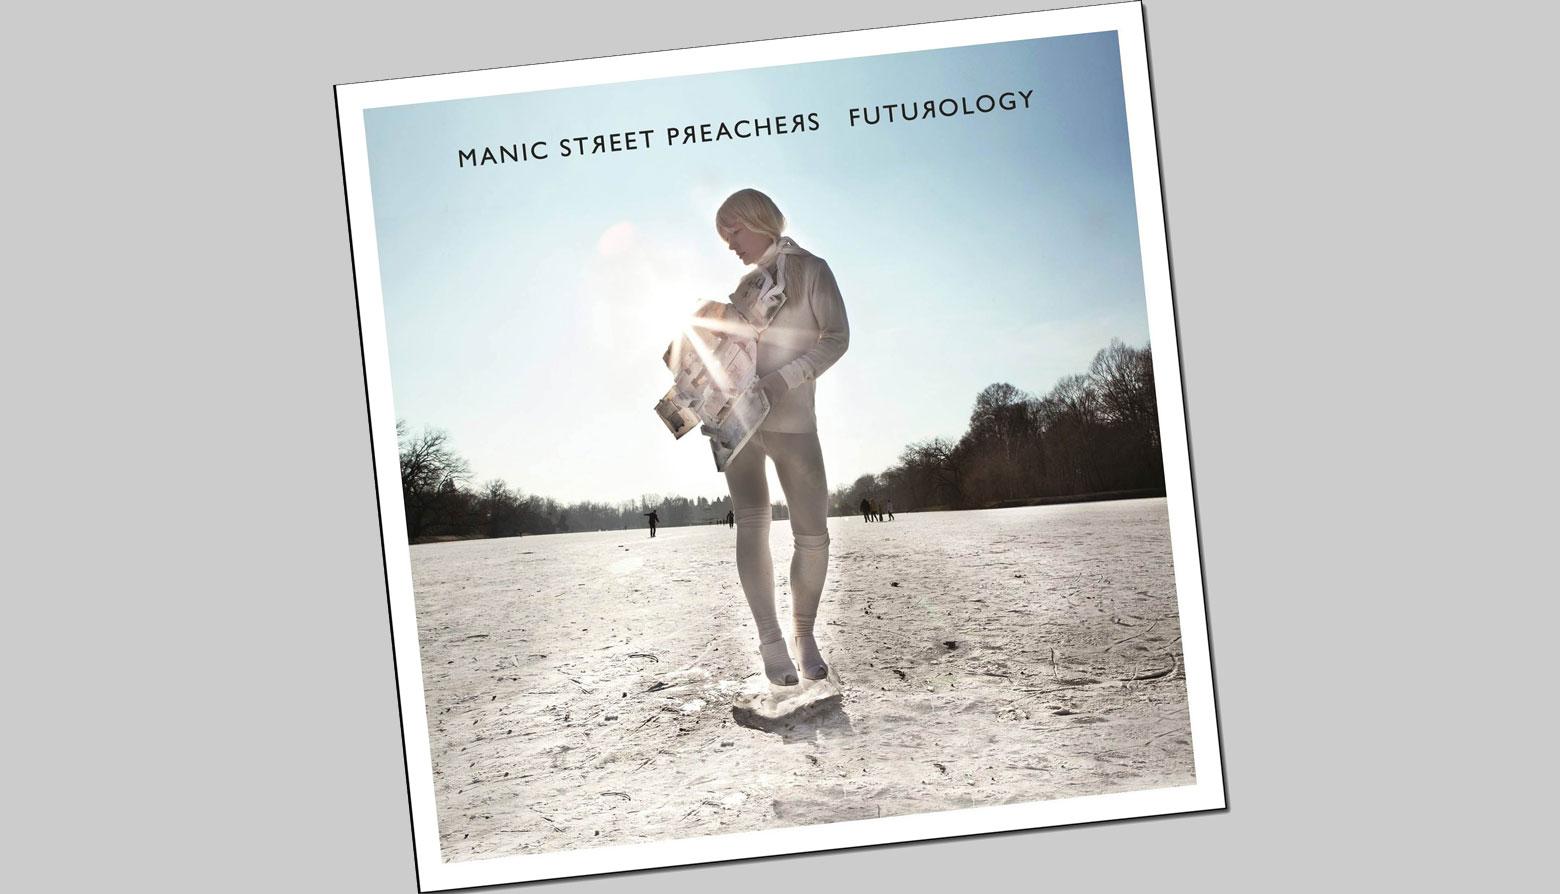 manic_street_preachers_futurology-portada